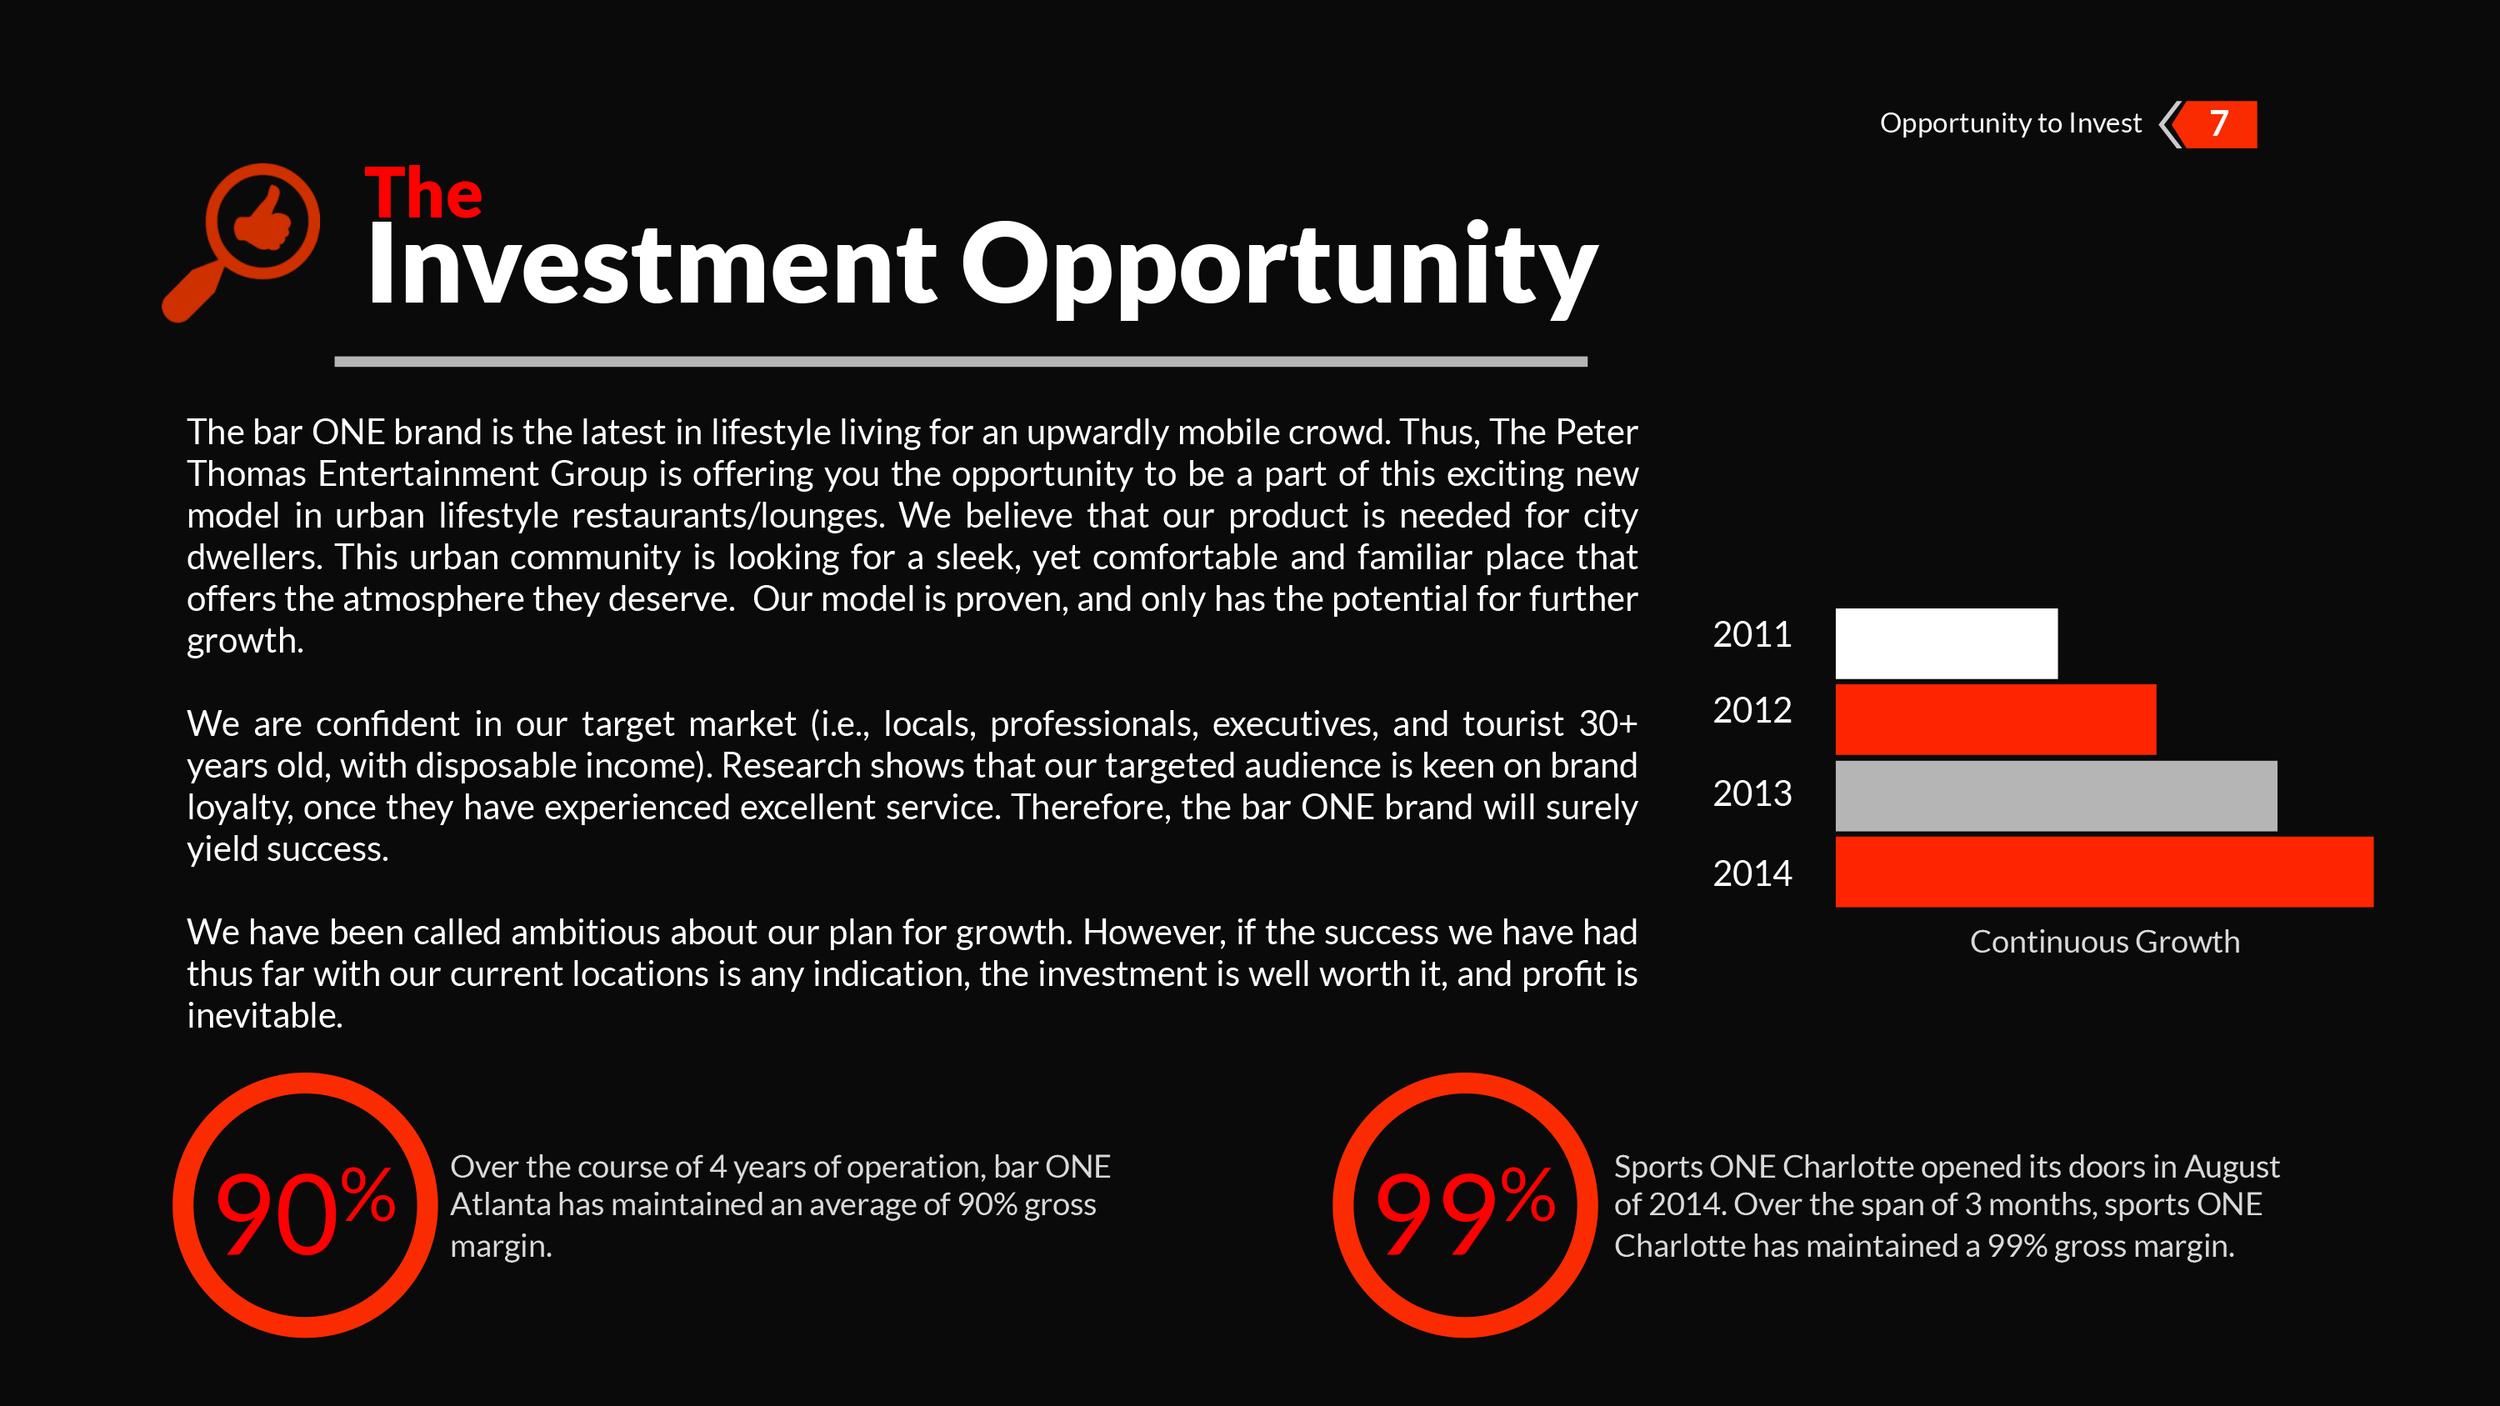 BarONE_Investor-Summary-7.jpg